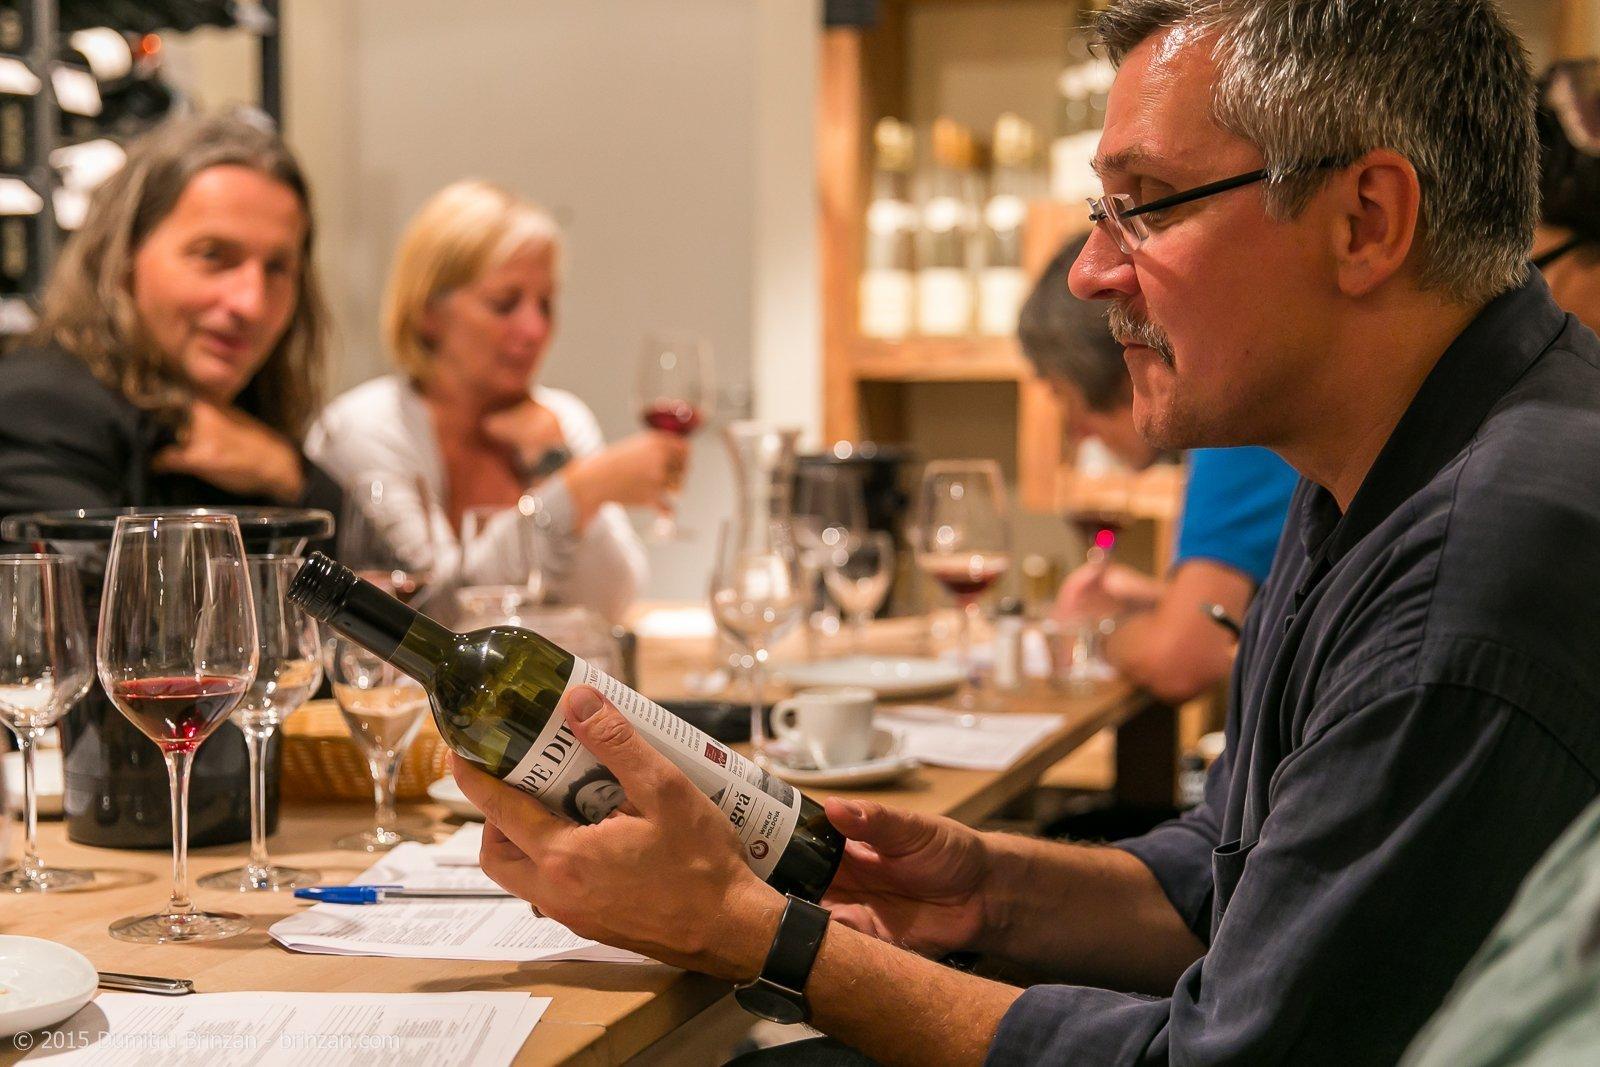 weinadvokat-dortmund-moldovan-wines-2015-23